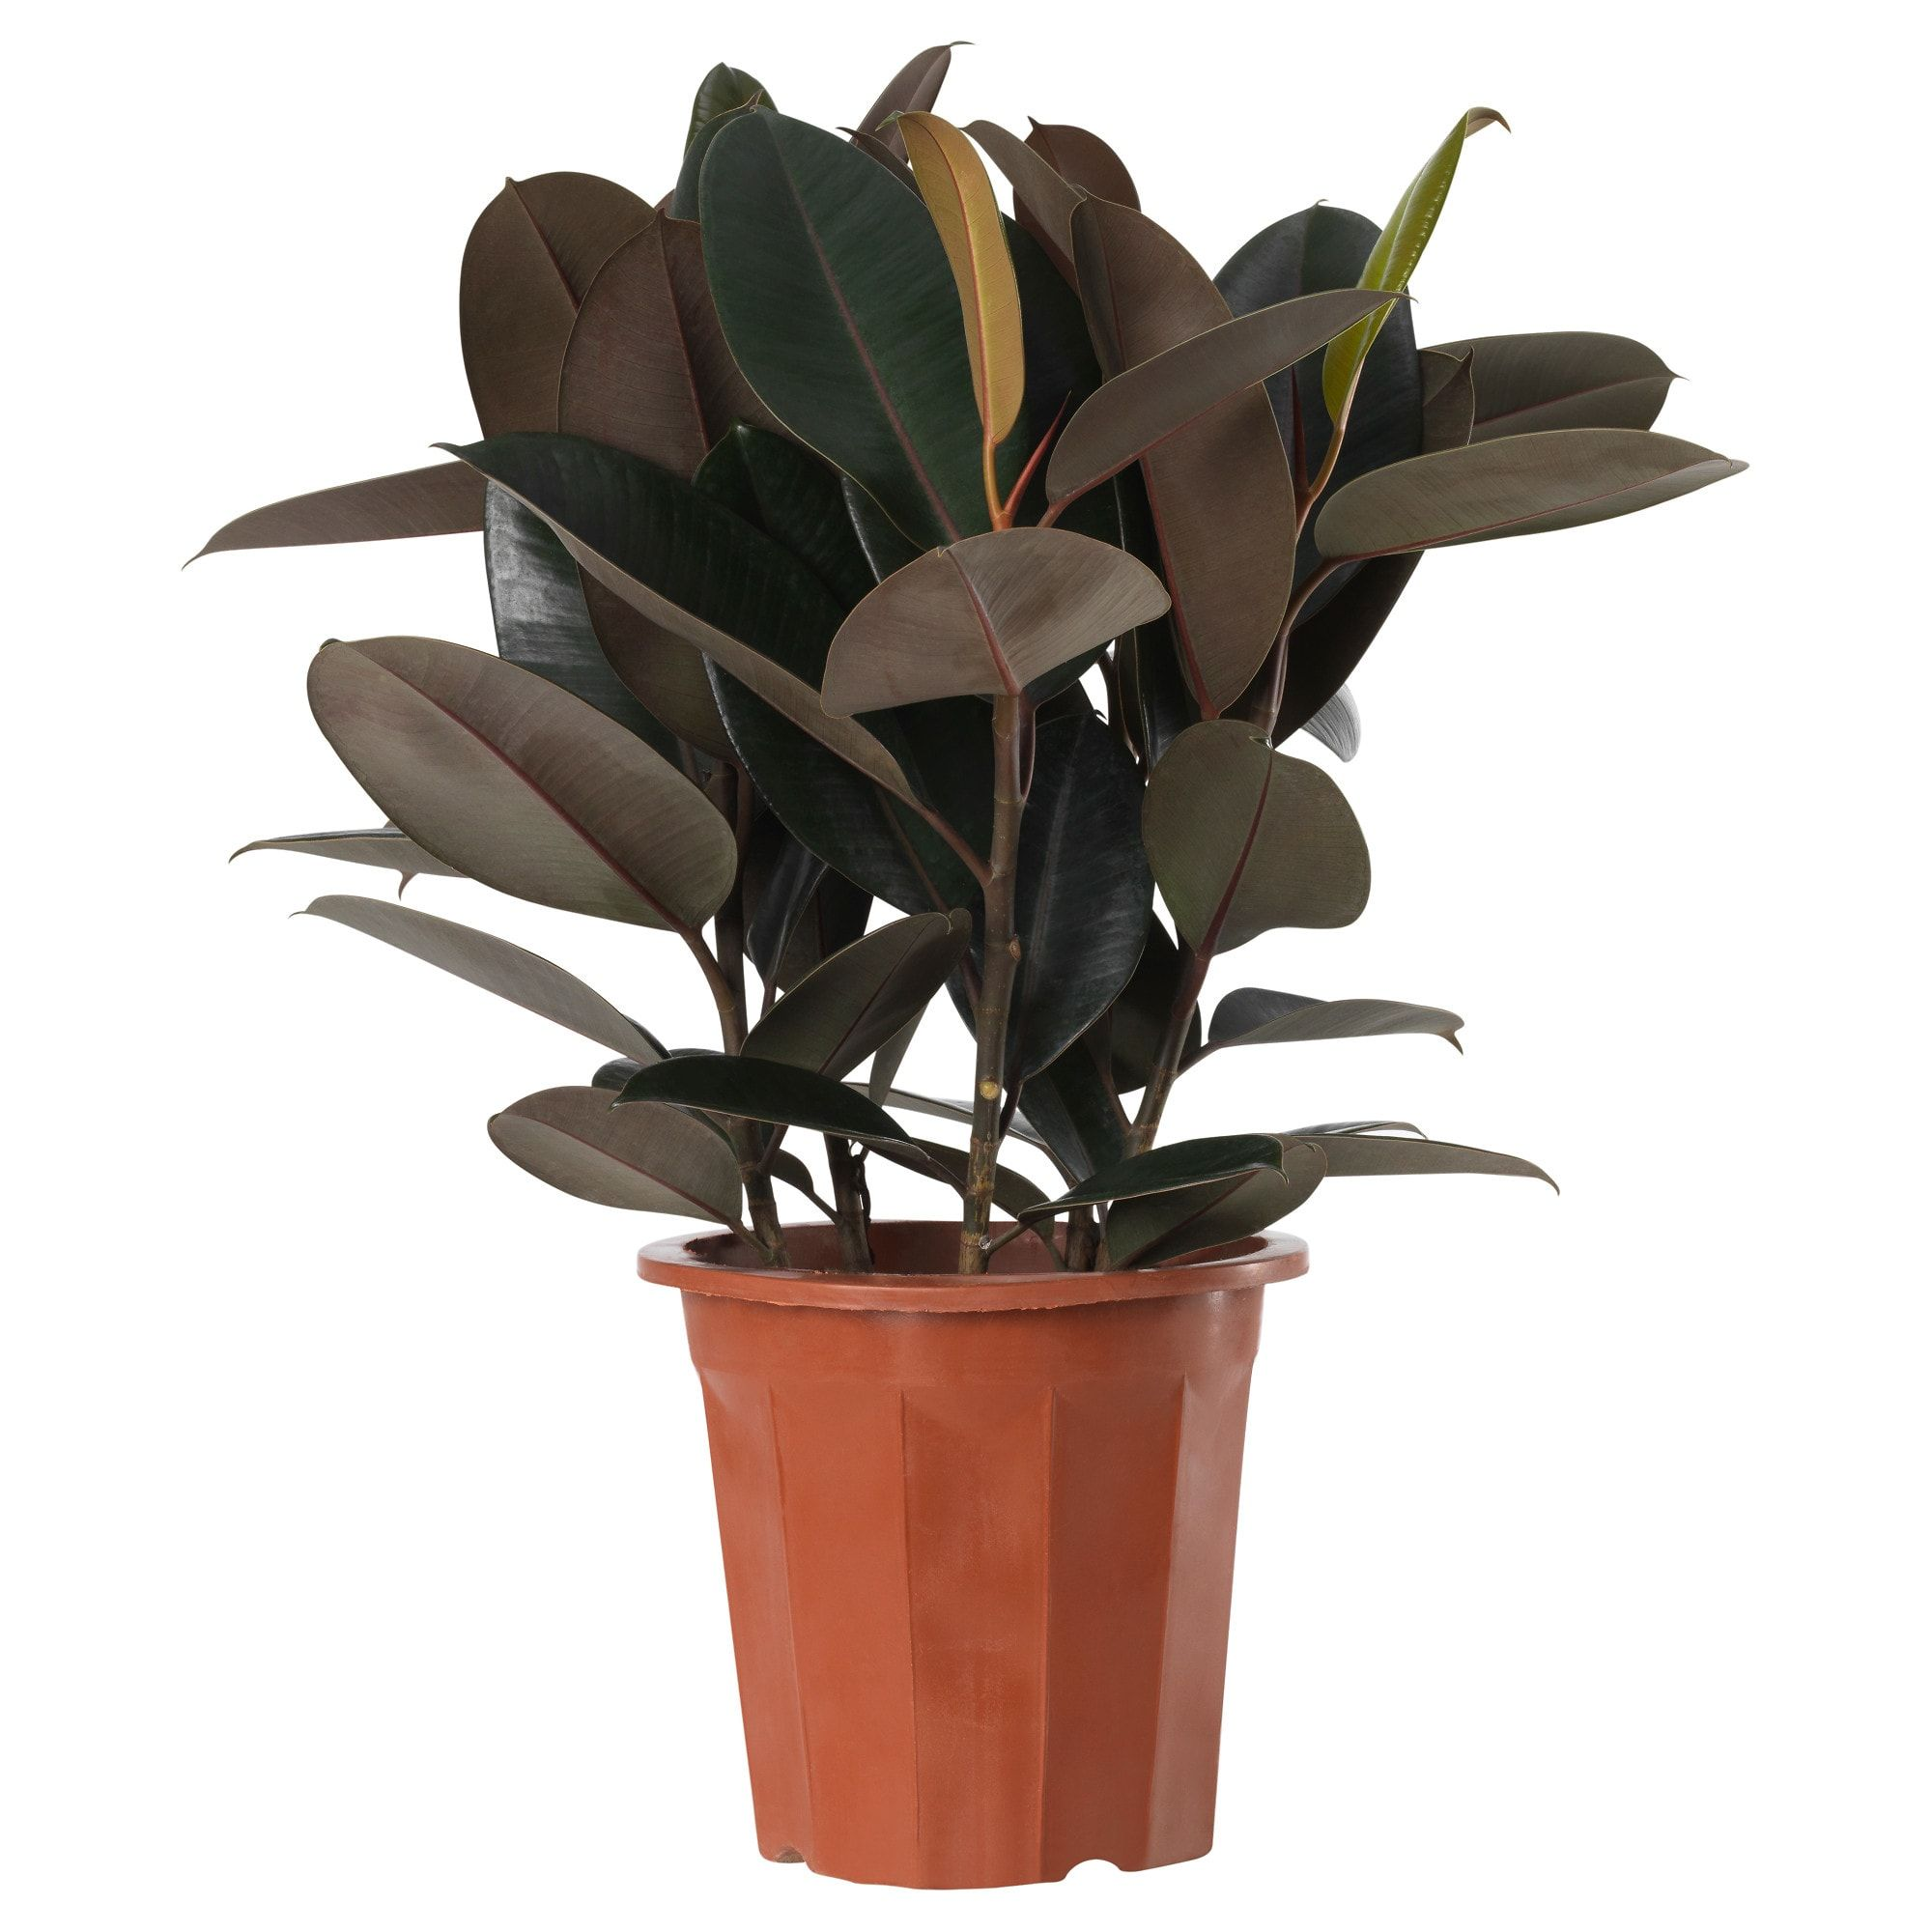 "FICUS ELASTICA Potted plant Rubber plant 10 "" Ficus"